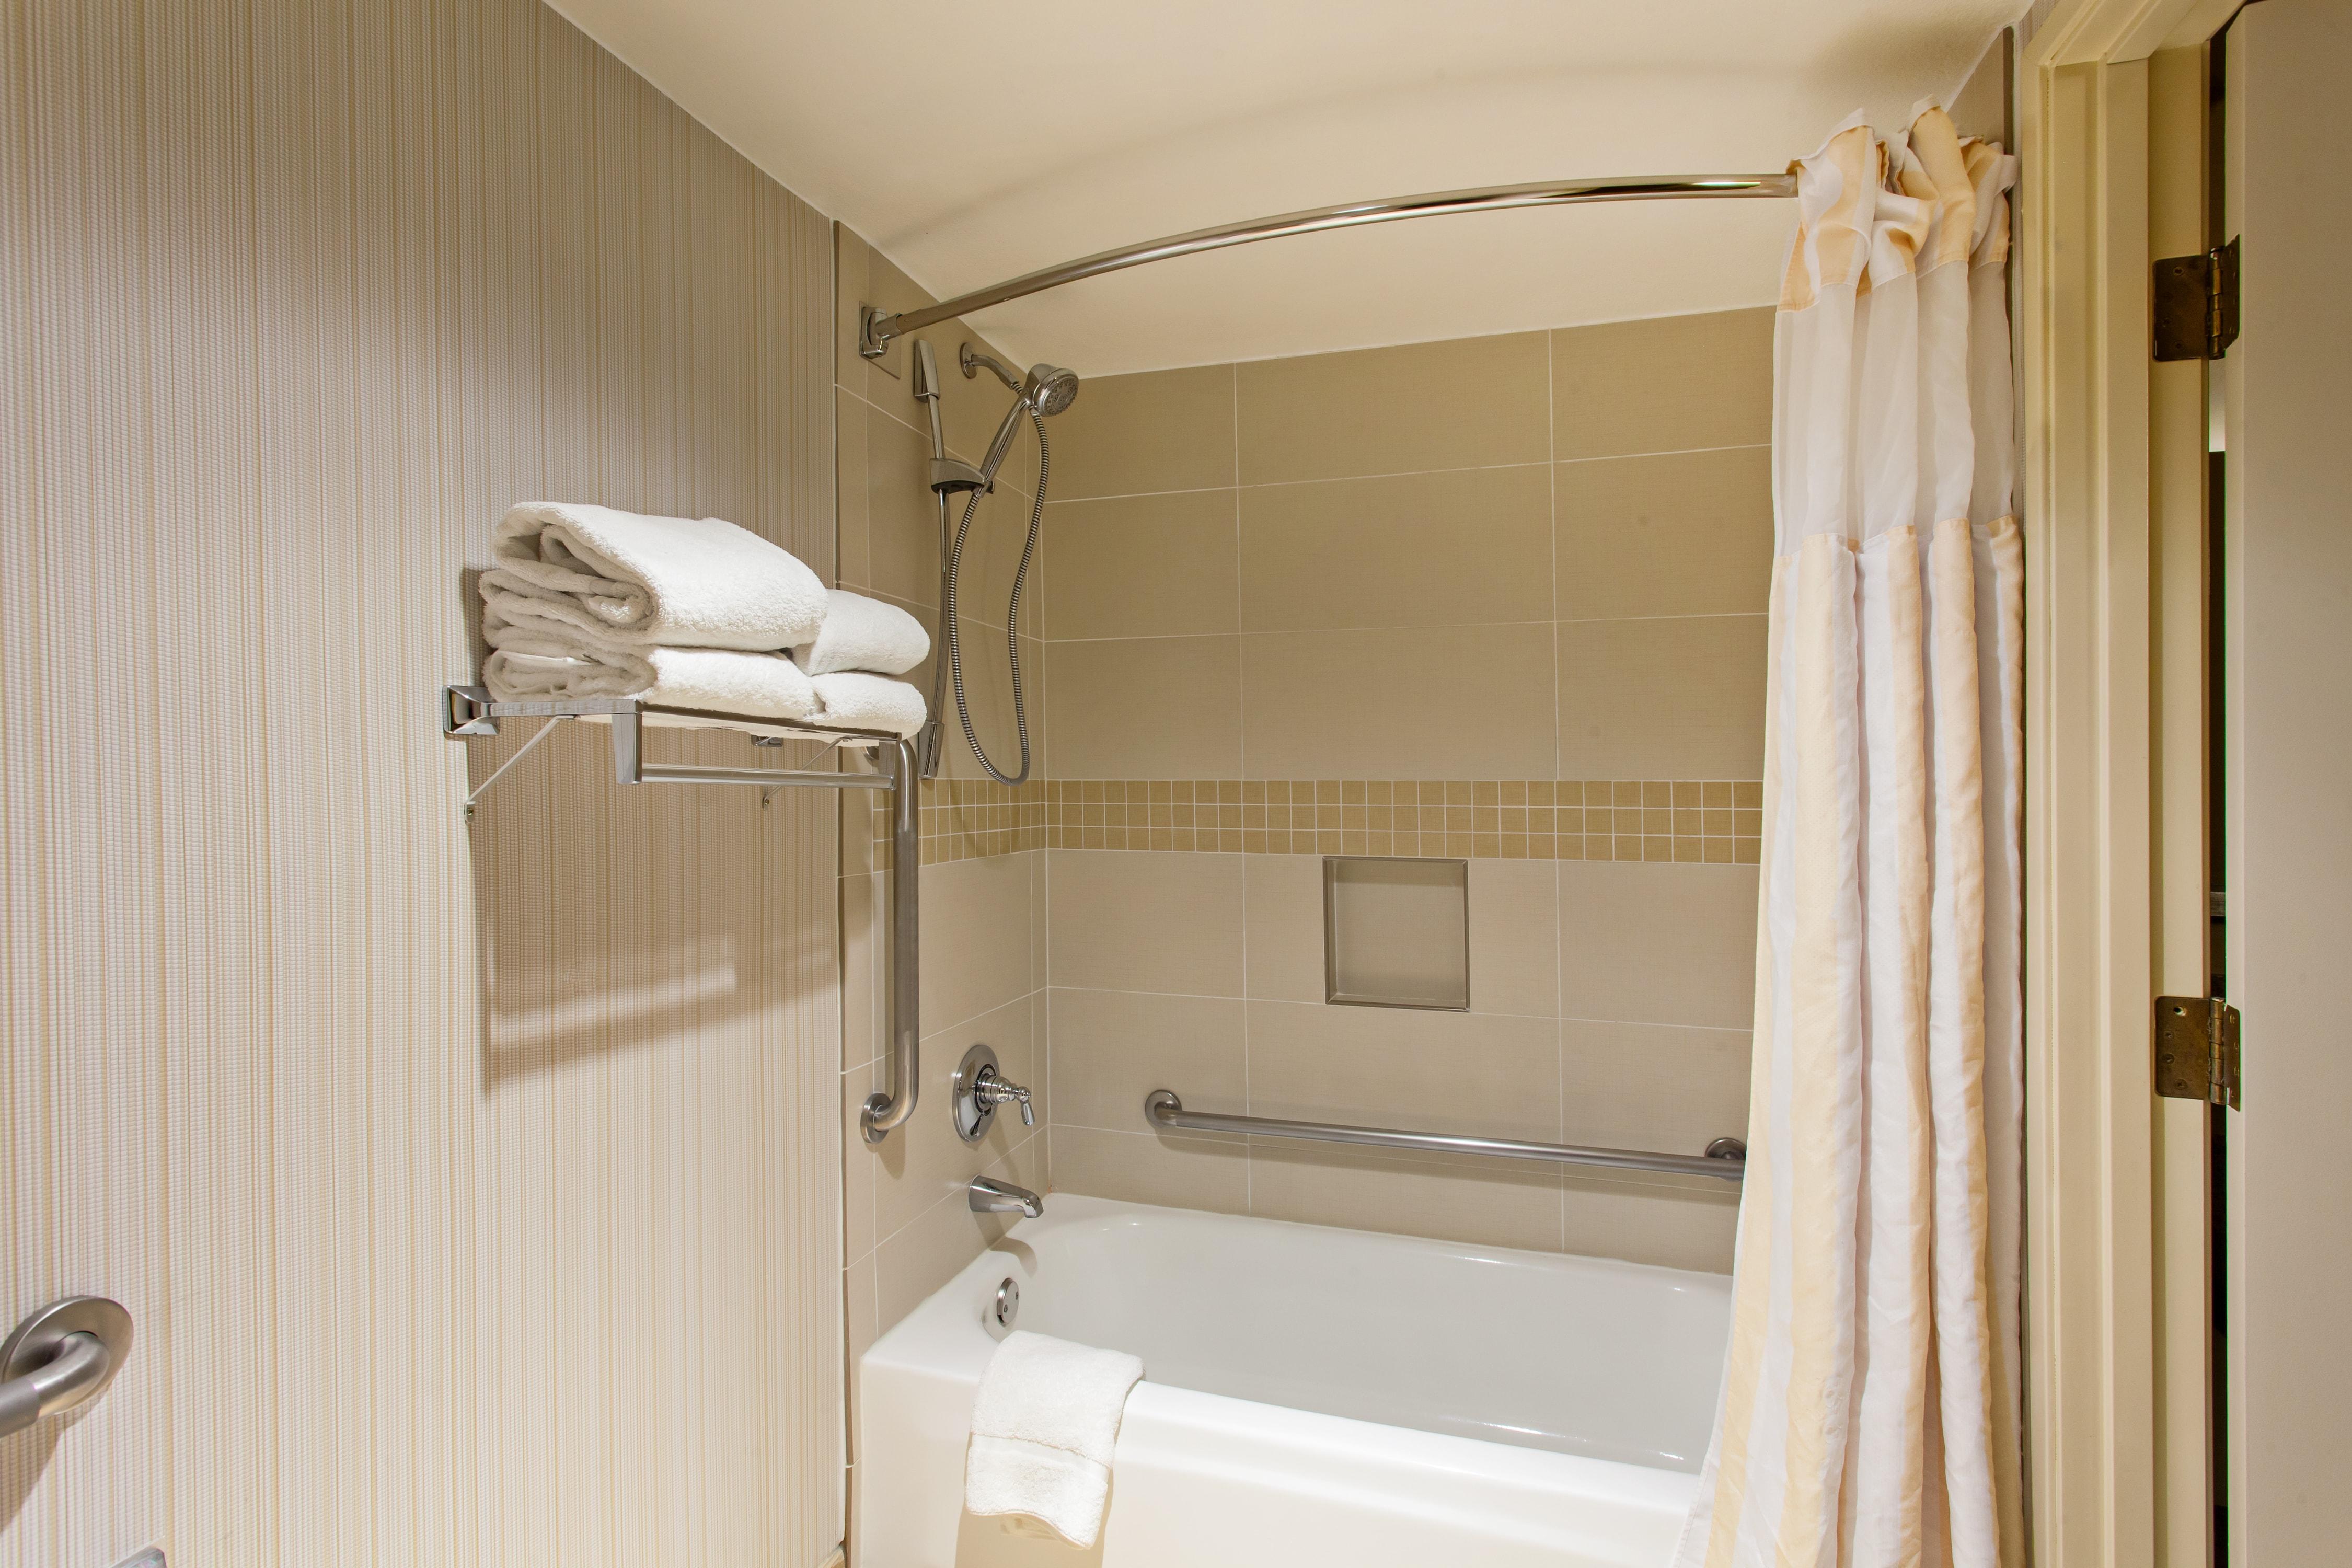 Hotels and motels in Valencia, PA - Valencia, Pennsylvania Hotels ...